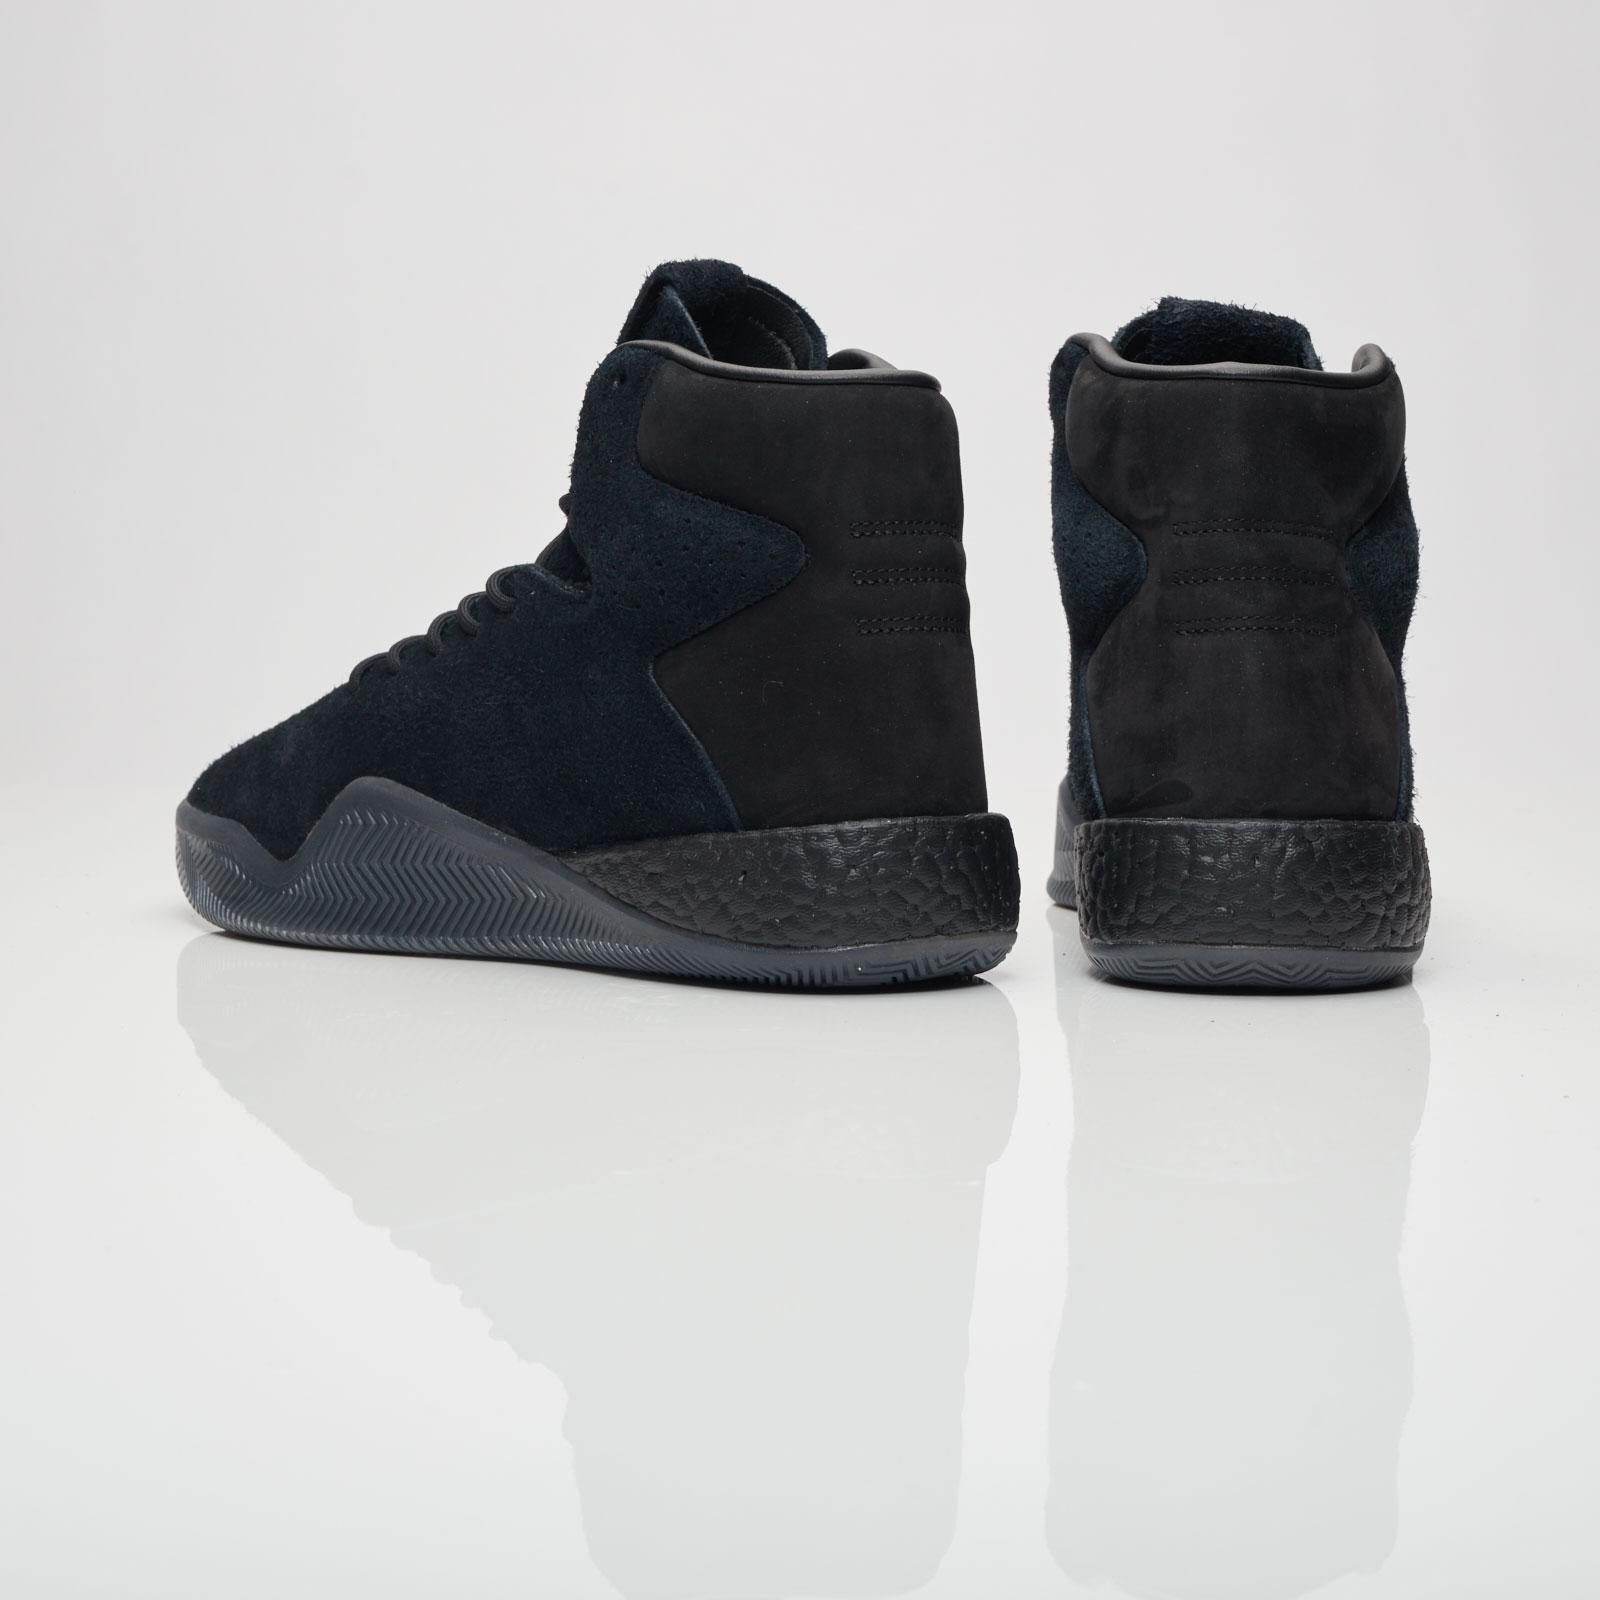 uk availability a0cc7 ad966 adidas Tubular Instinct - Bb8931 - Sneakersnstuff   sneakers ...